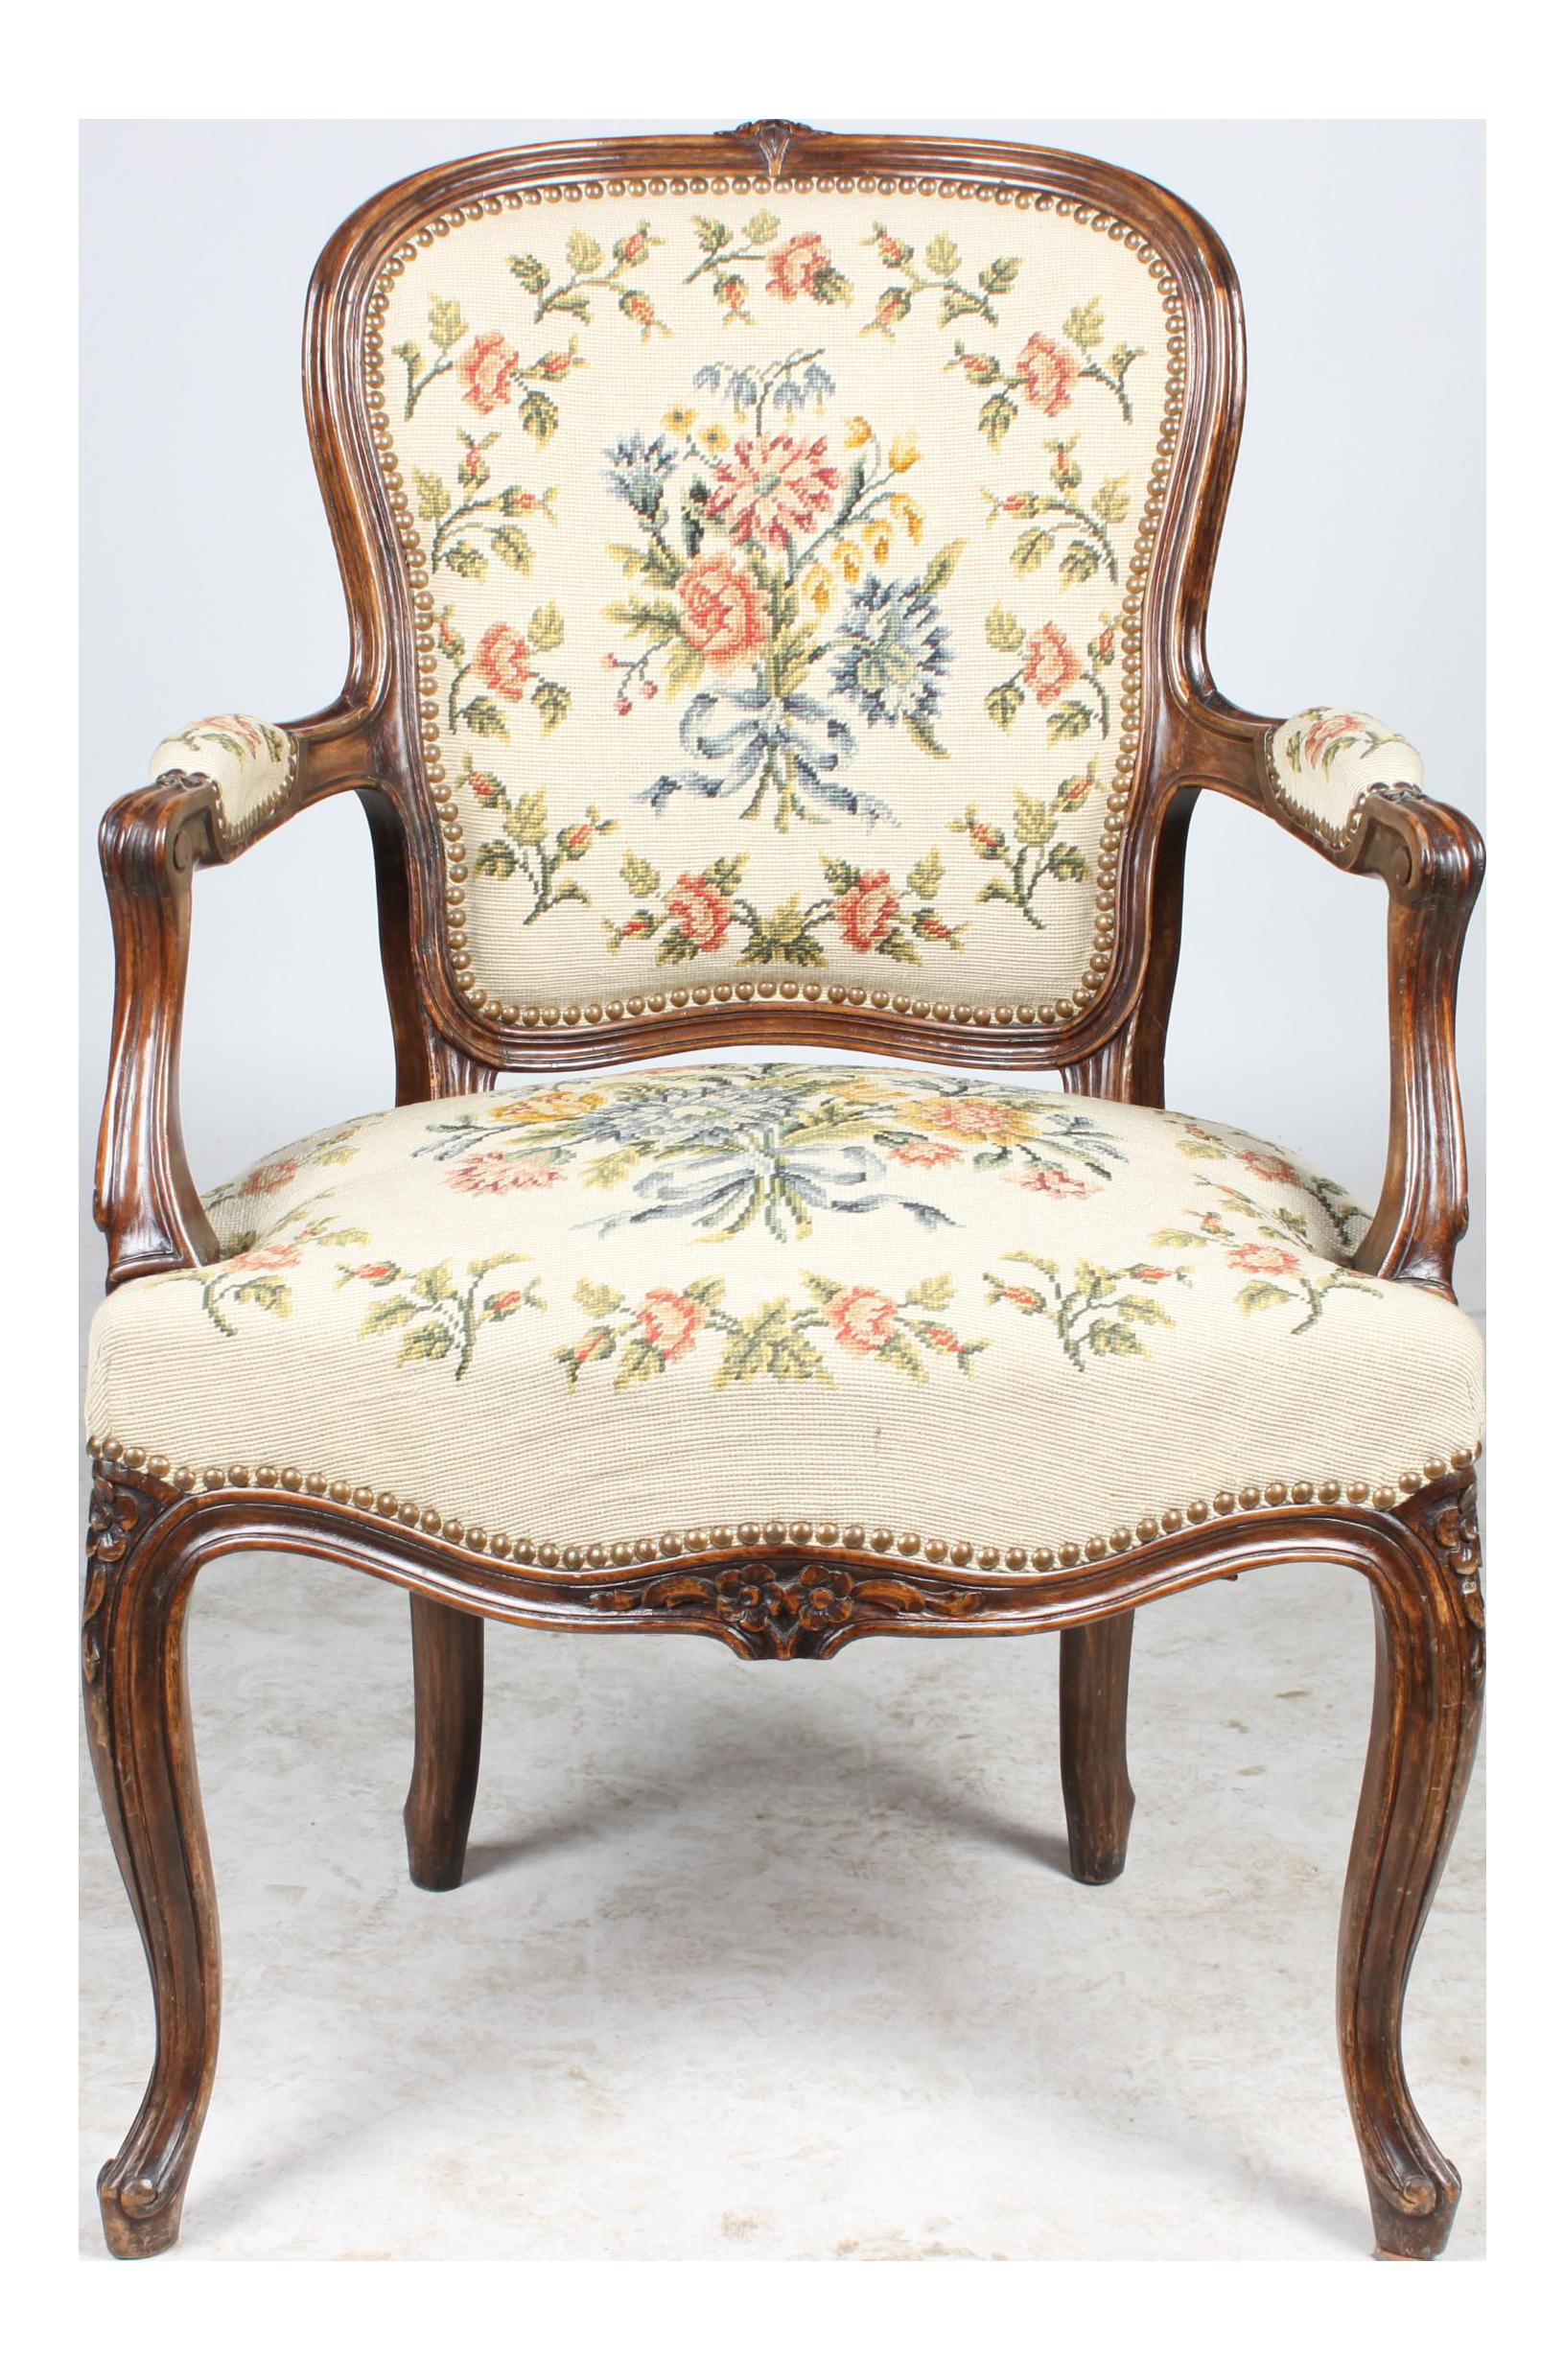 Needlepoint walnut fauteuil chair